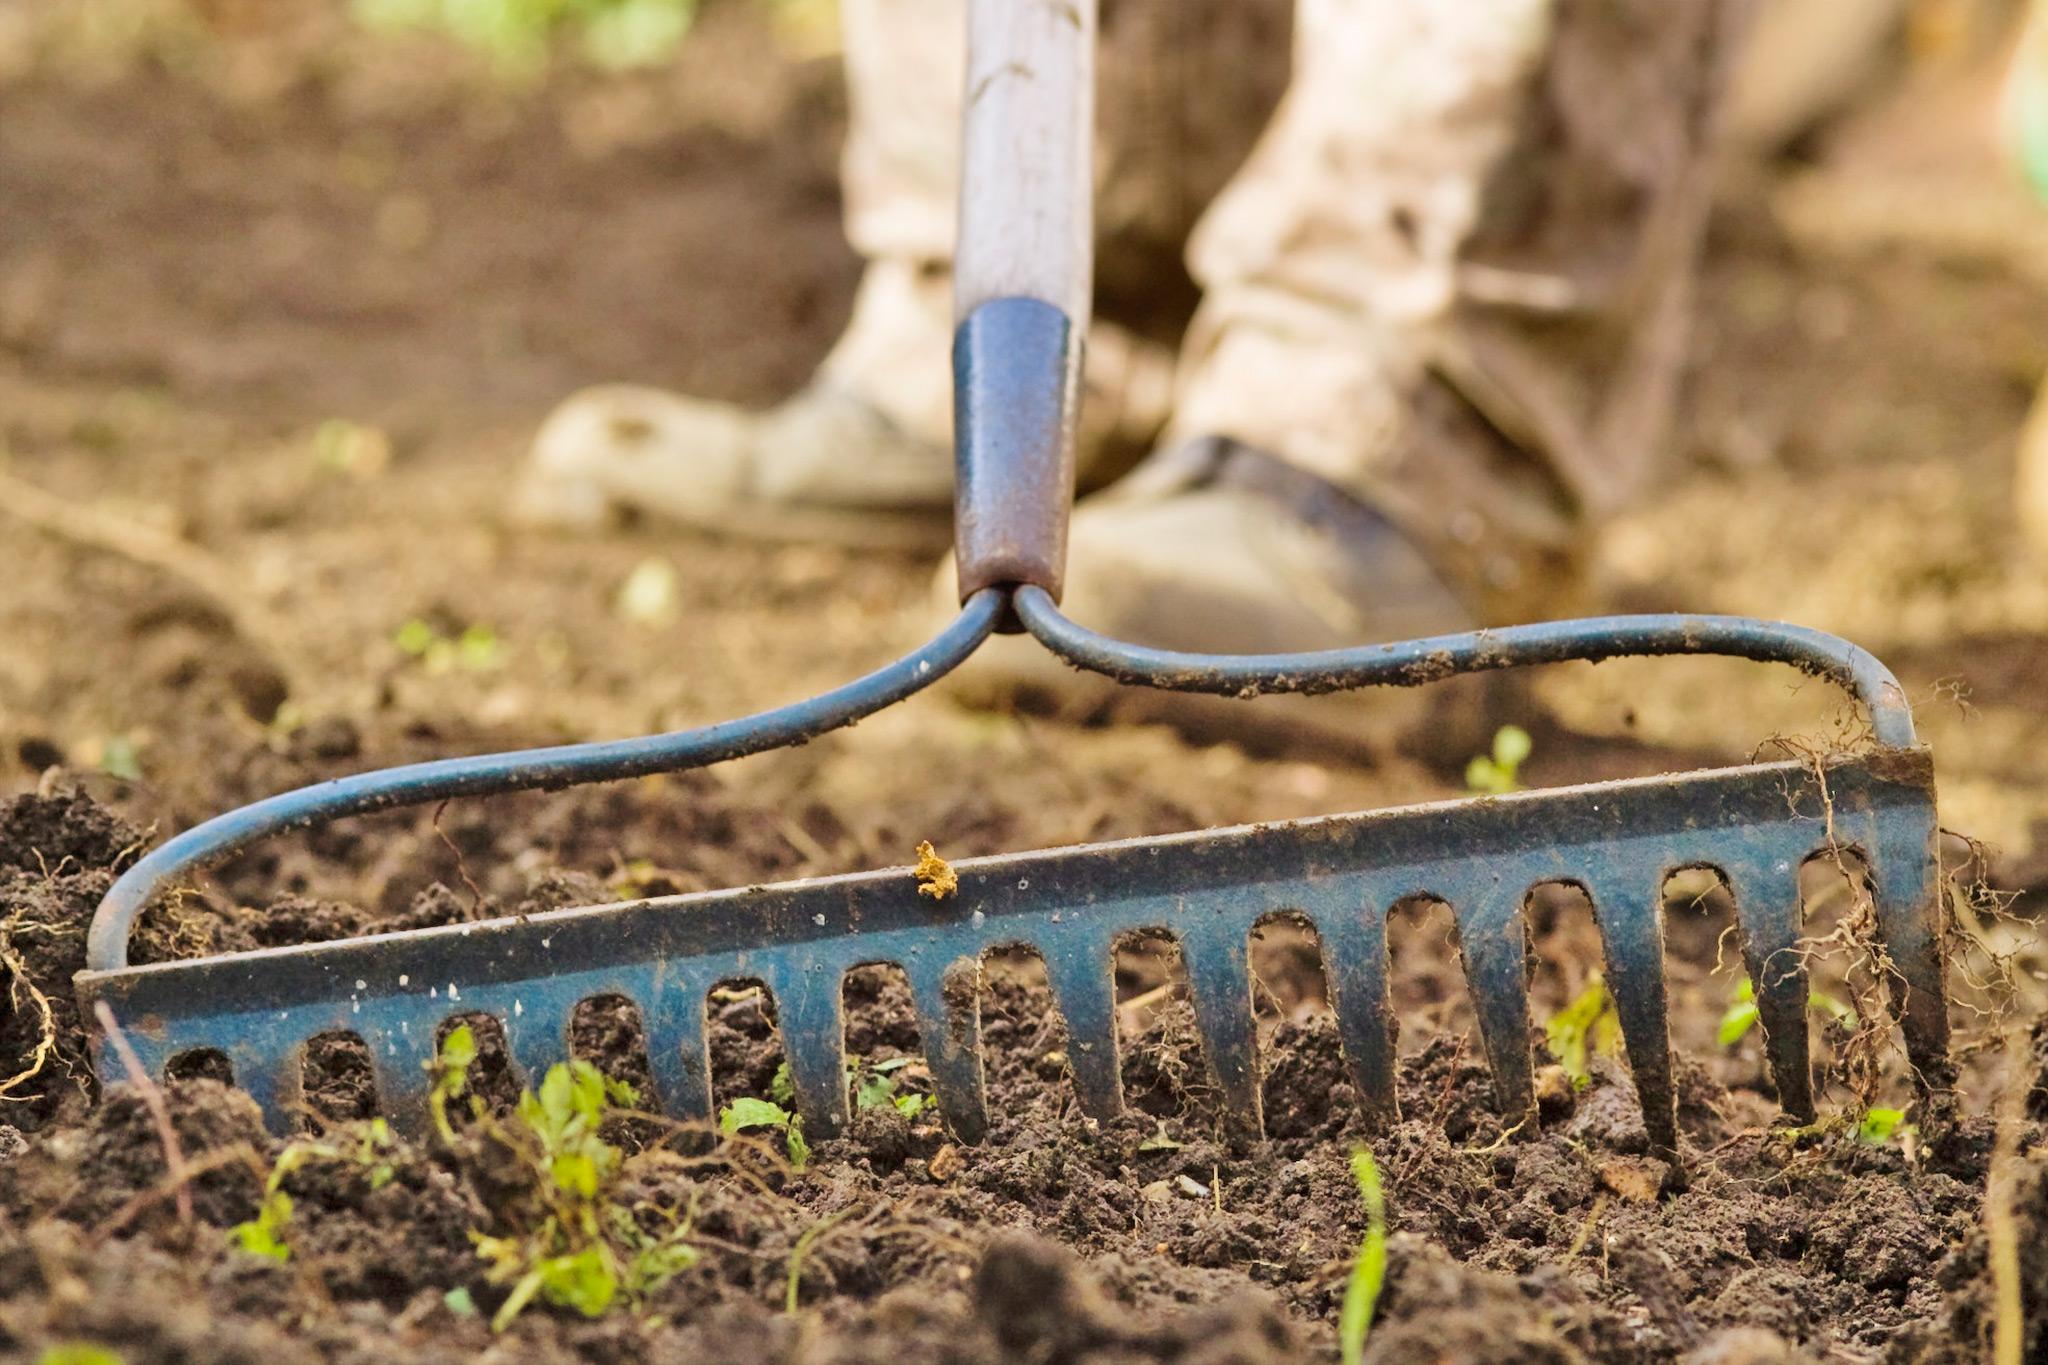 raking-topsoil-to-level-the-lawn-area-3